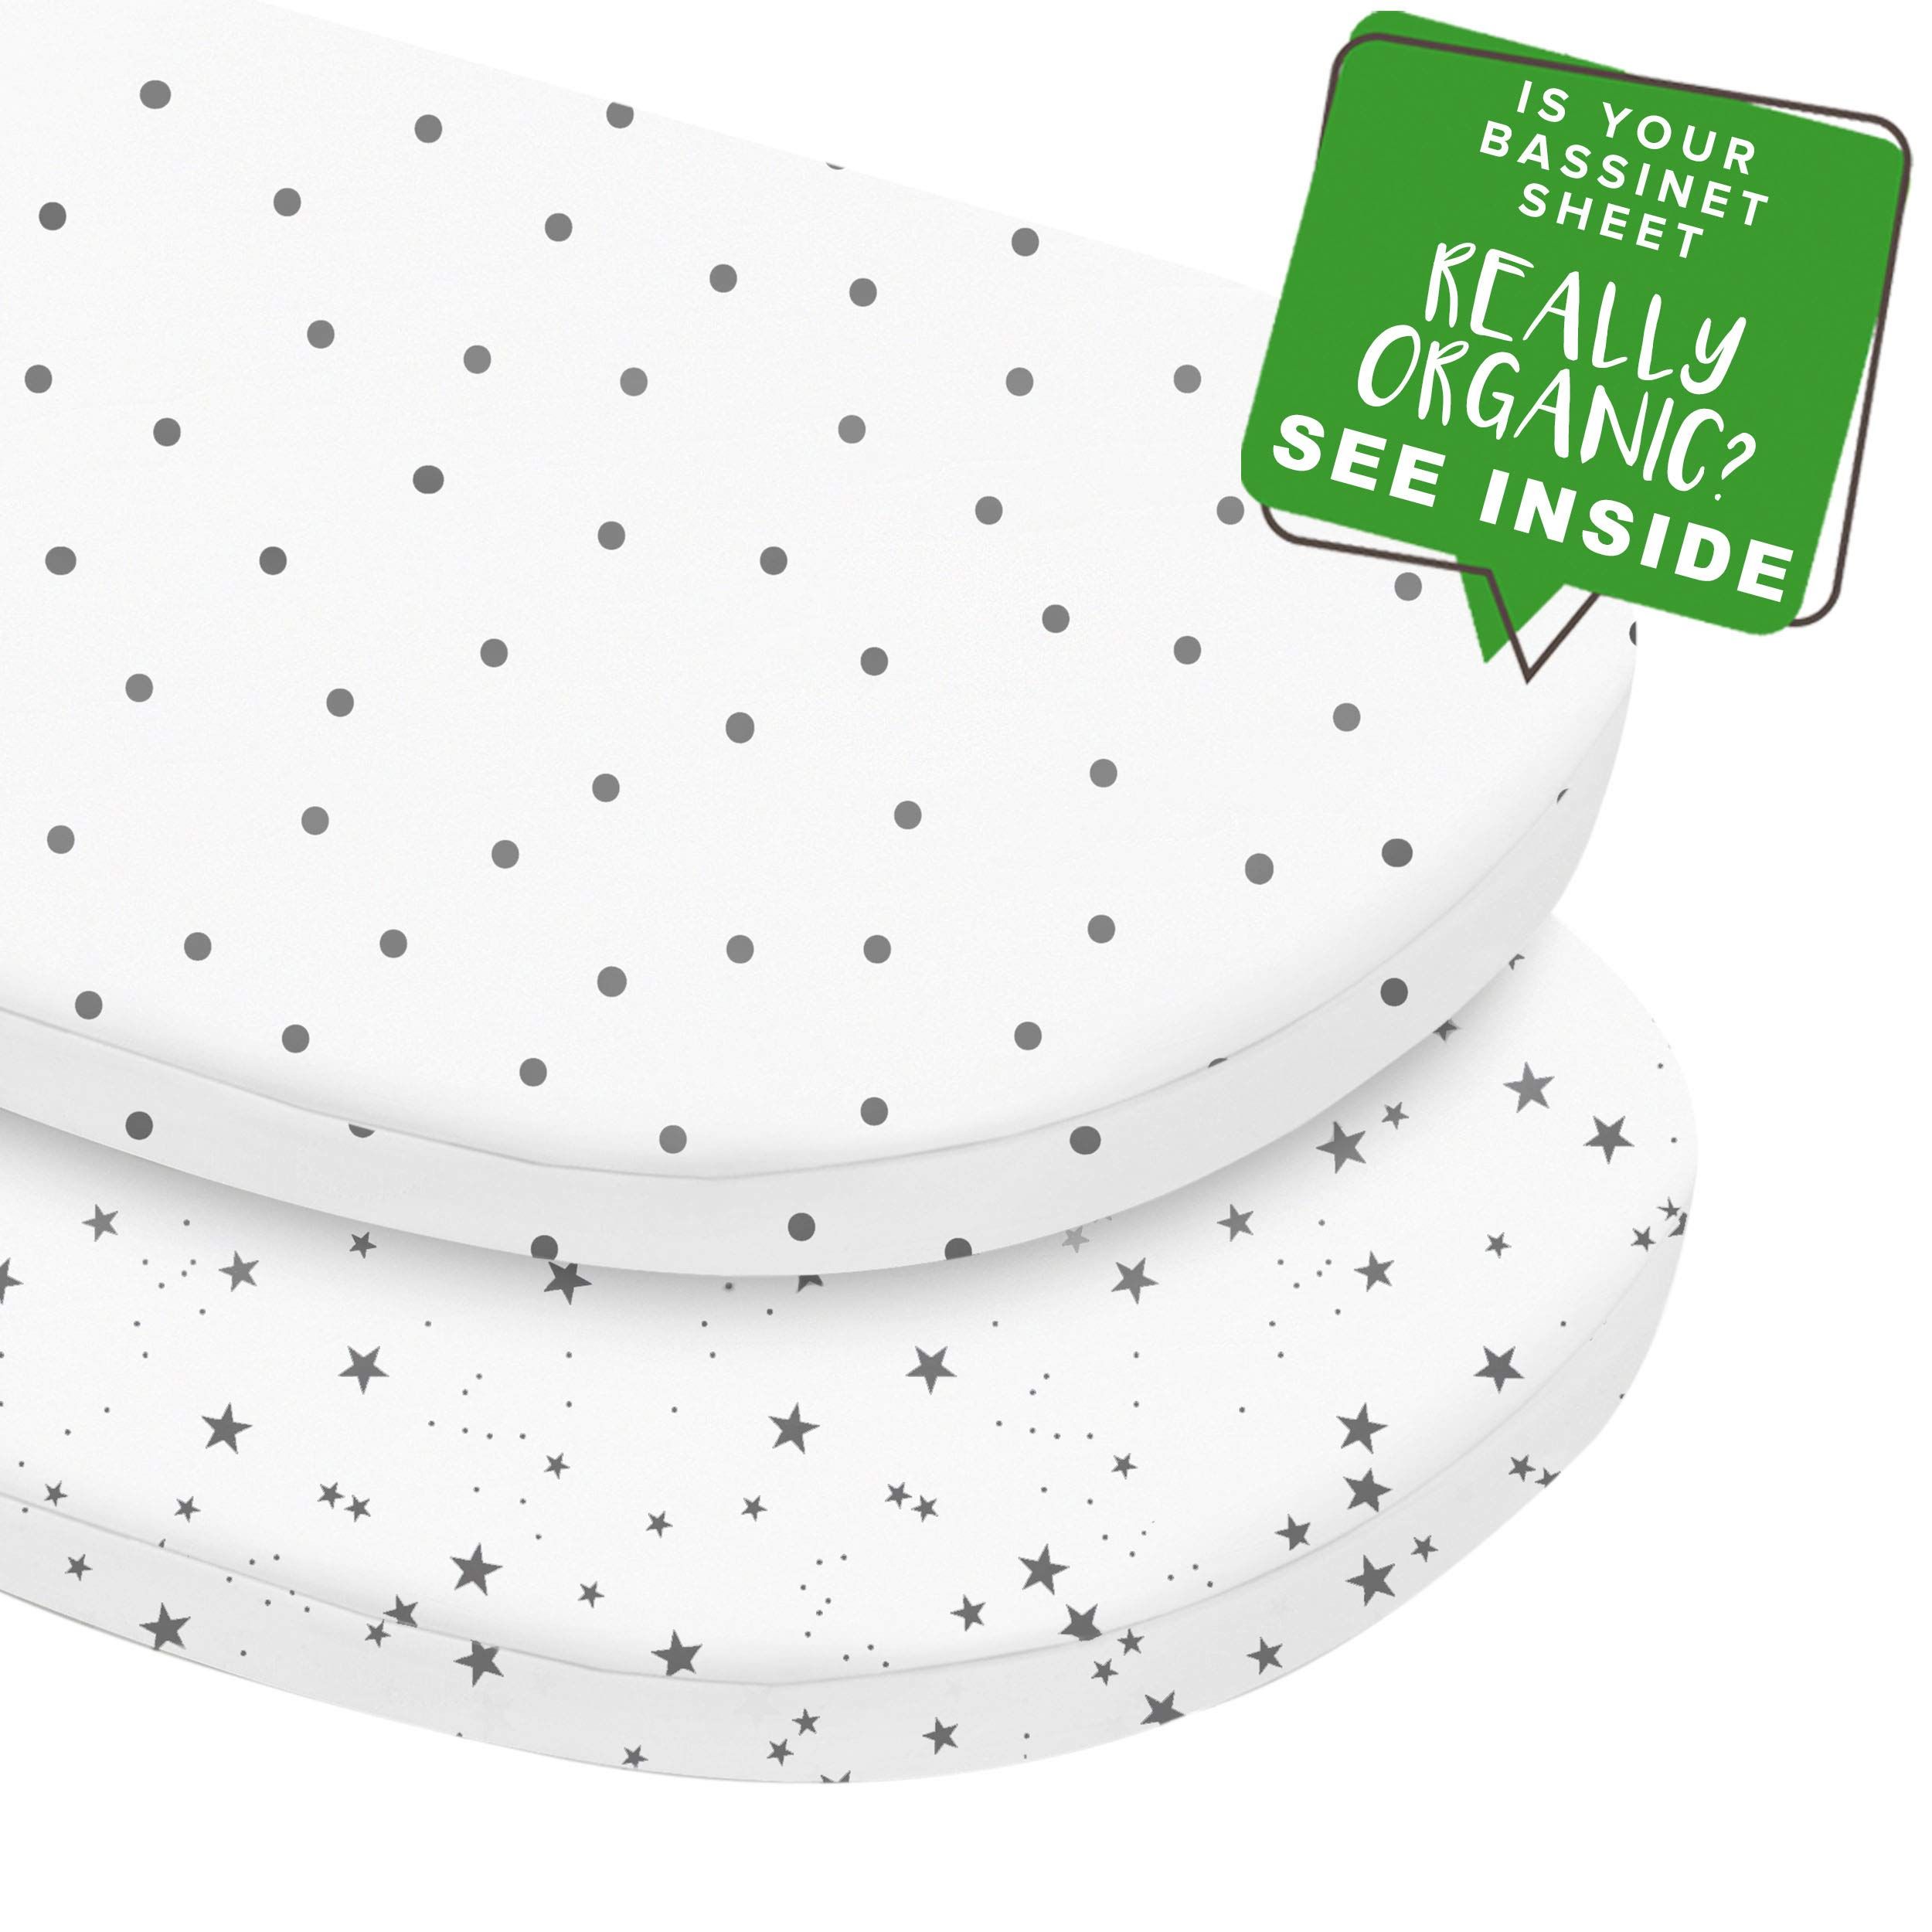 MakeMake Organics Organic Cotton Bassinet Sheet (Set of 2) GOTS Certified Organic Bassinet Mattress Pad Cover Ultra Soft Breathable Fits Hourglass Rectangle Oval (15''x33''+4'', Polka Dot & Stars, White) by MakeMake Organics